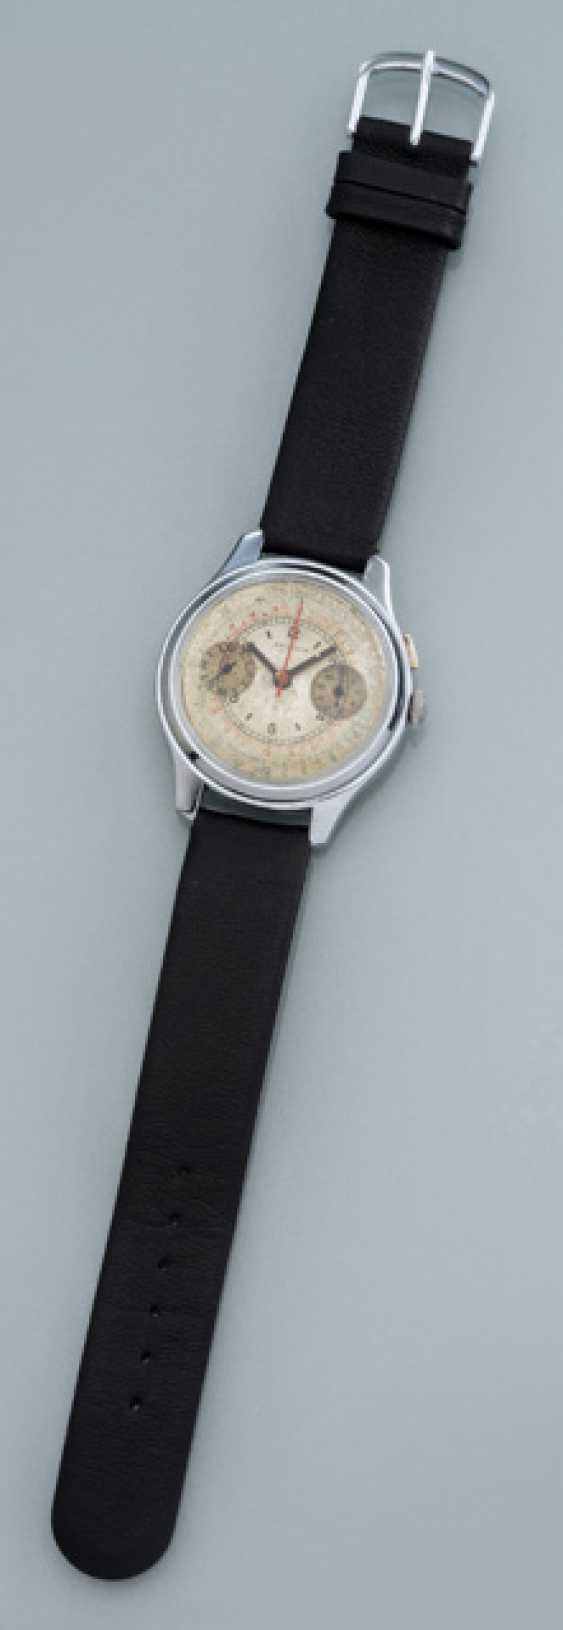 Angelus Monopusher Chronograph - photo 1